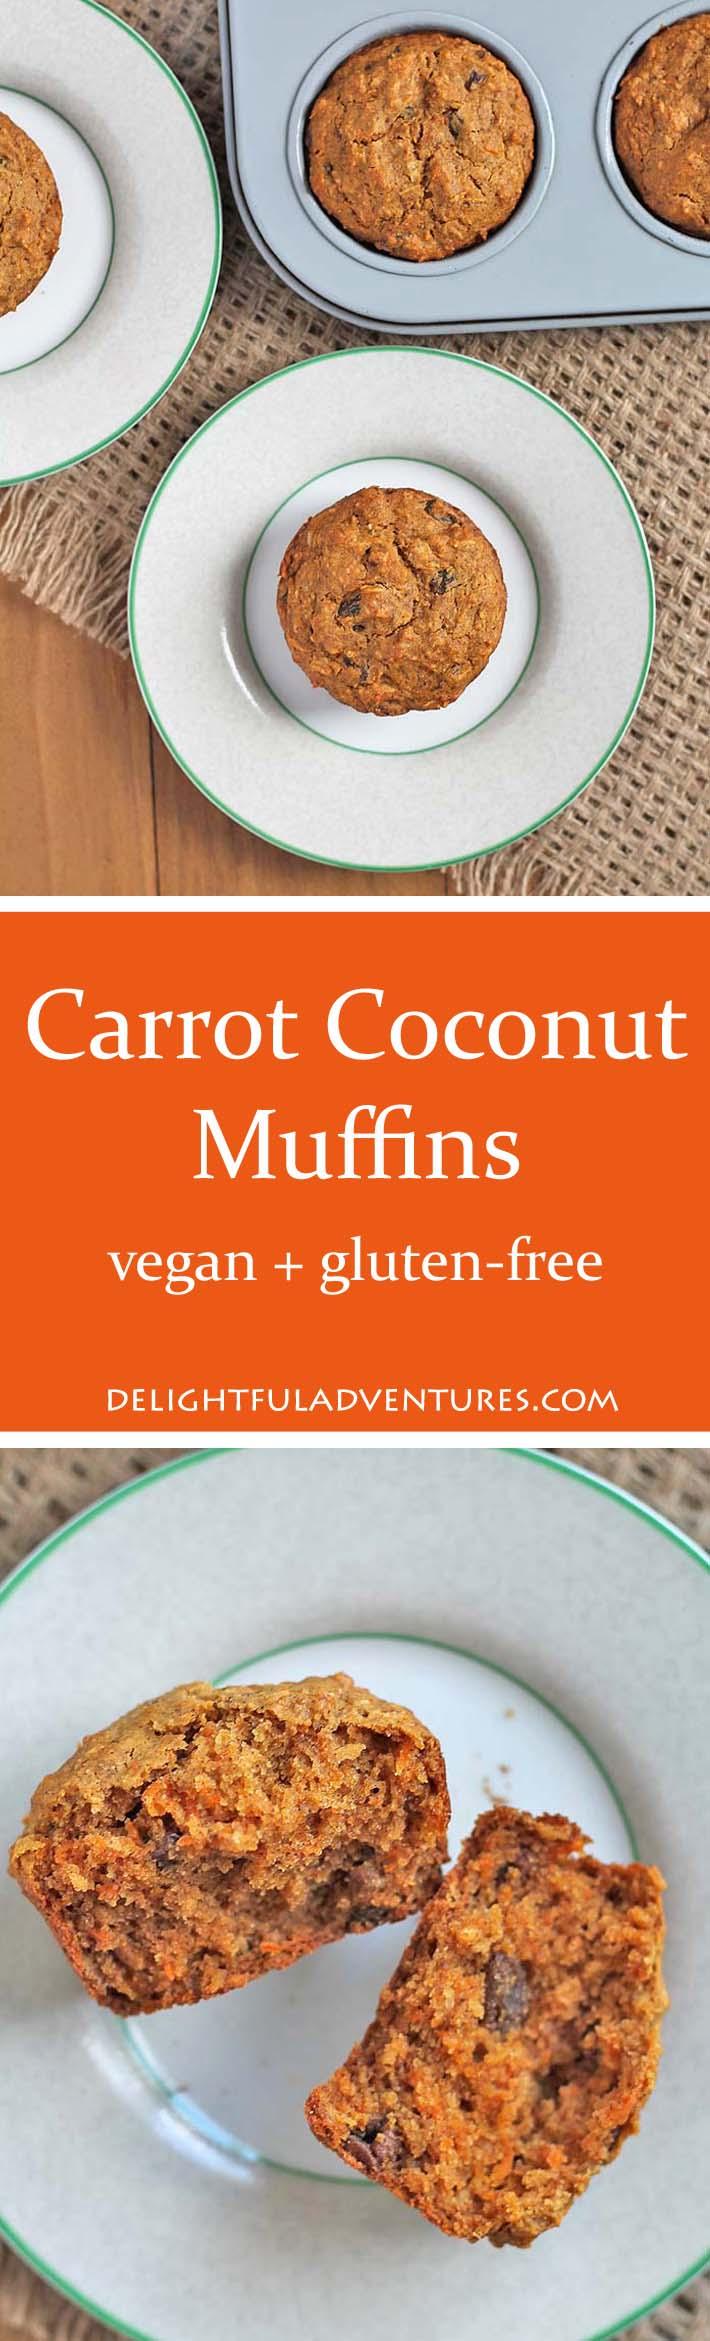 Vegan Gluten-Free Carrot Coconut Muffins